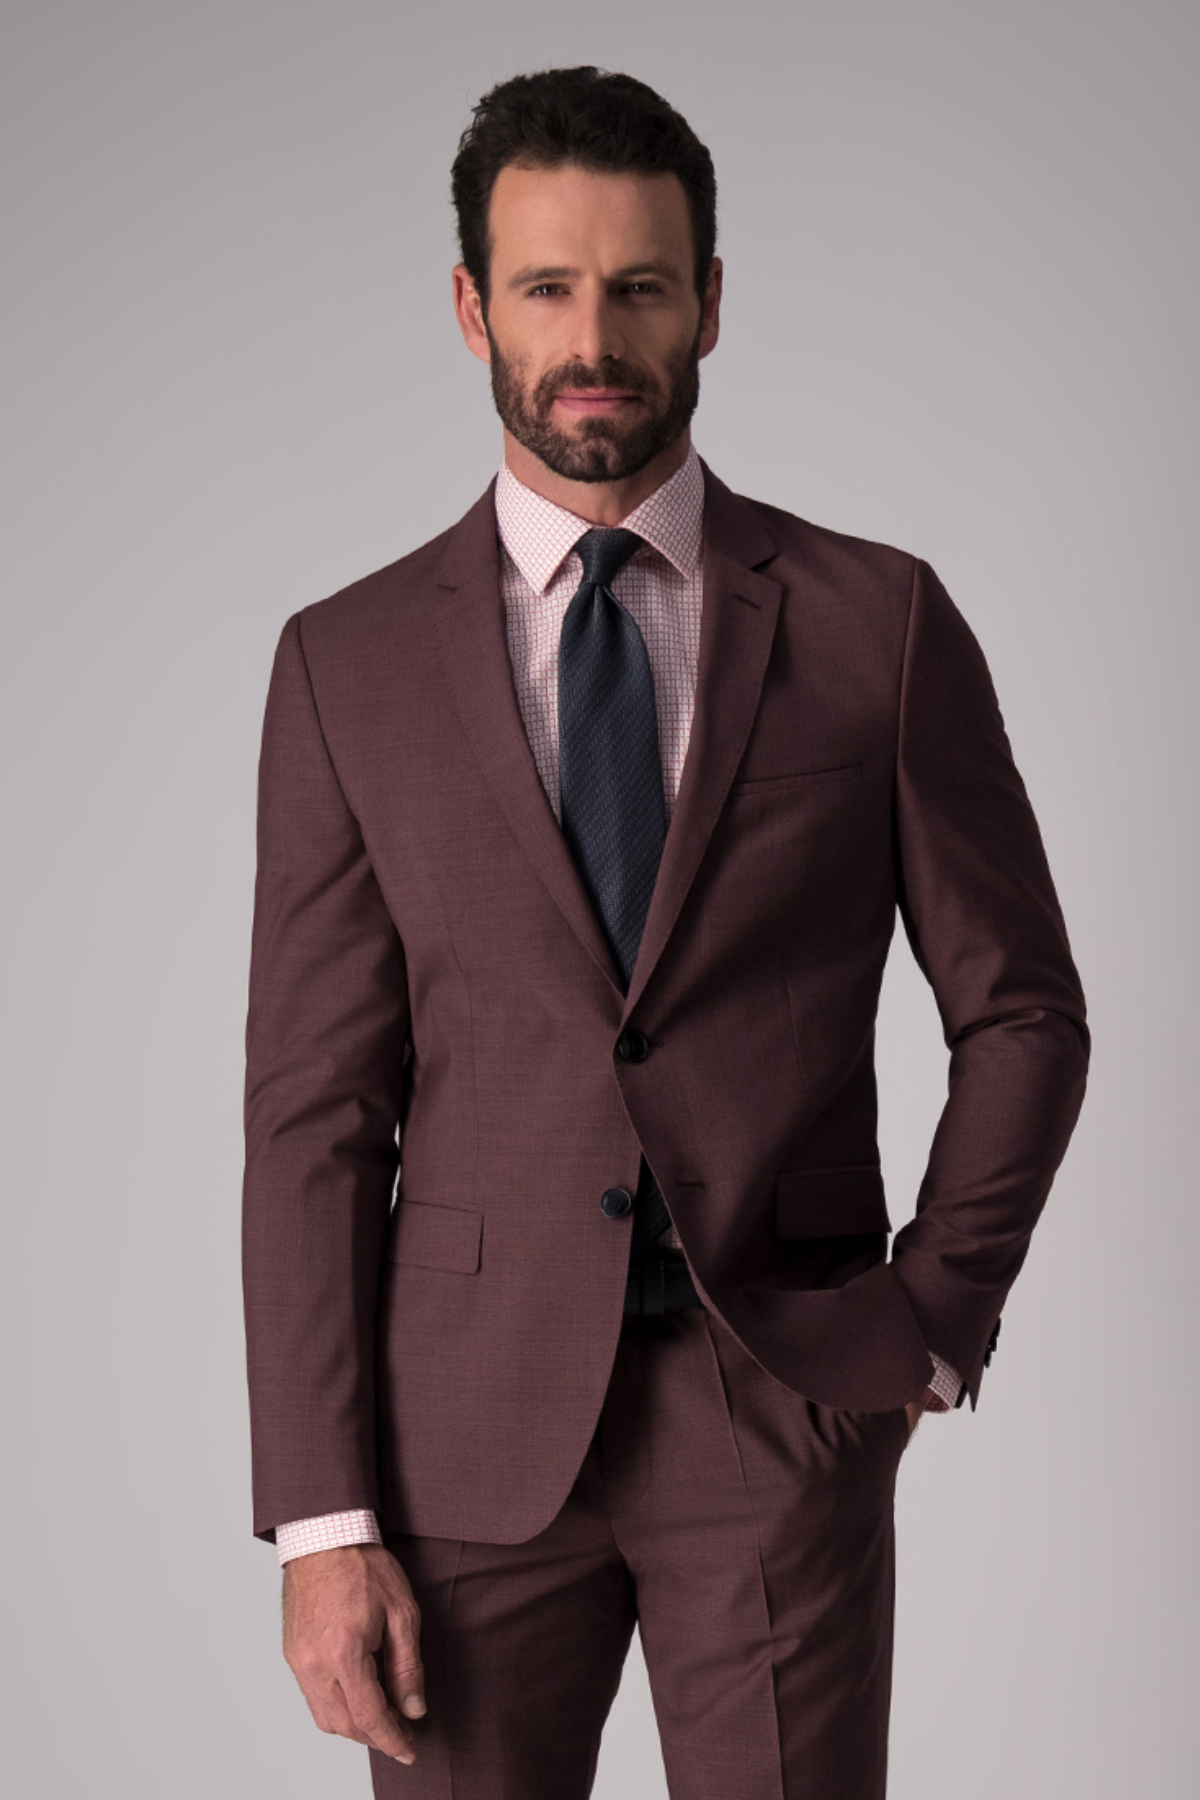 Traje Hugo Boss, 100%lana, slim fit, liso color vino.